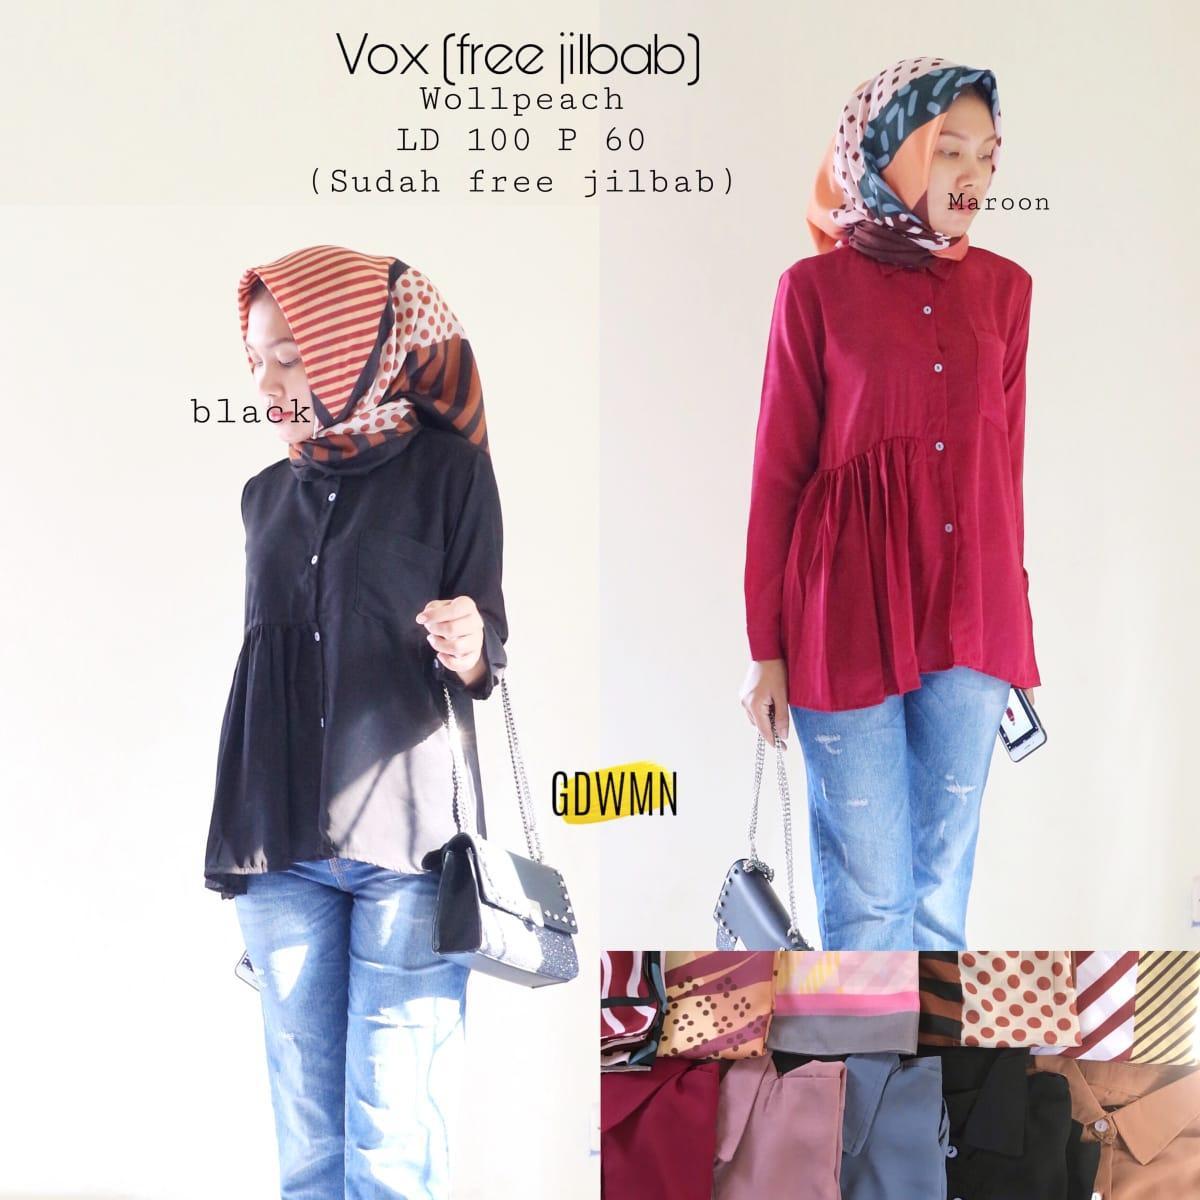 Blouse Vox Wollpeach Free Jilbab Random Model Baju Gamis Modern Terbaru 2019 Tunik Ceruti Polos Brokat Batik Kombinasi  Style Hijab ootd Pashmina Segi Empat Kebaya Wanita  Model Blouse Batik Putih